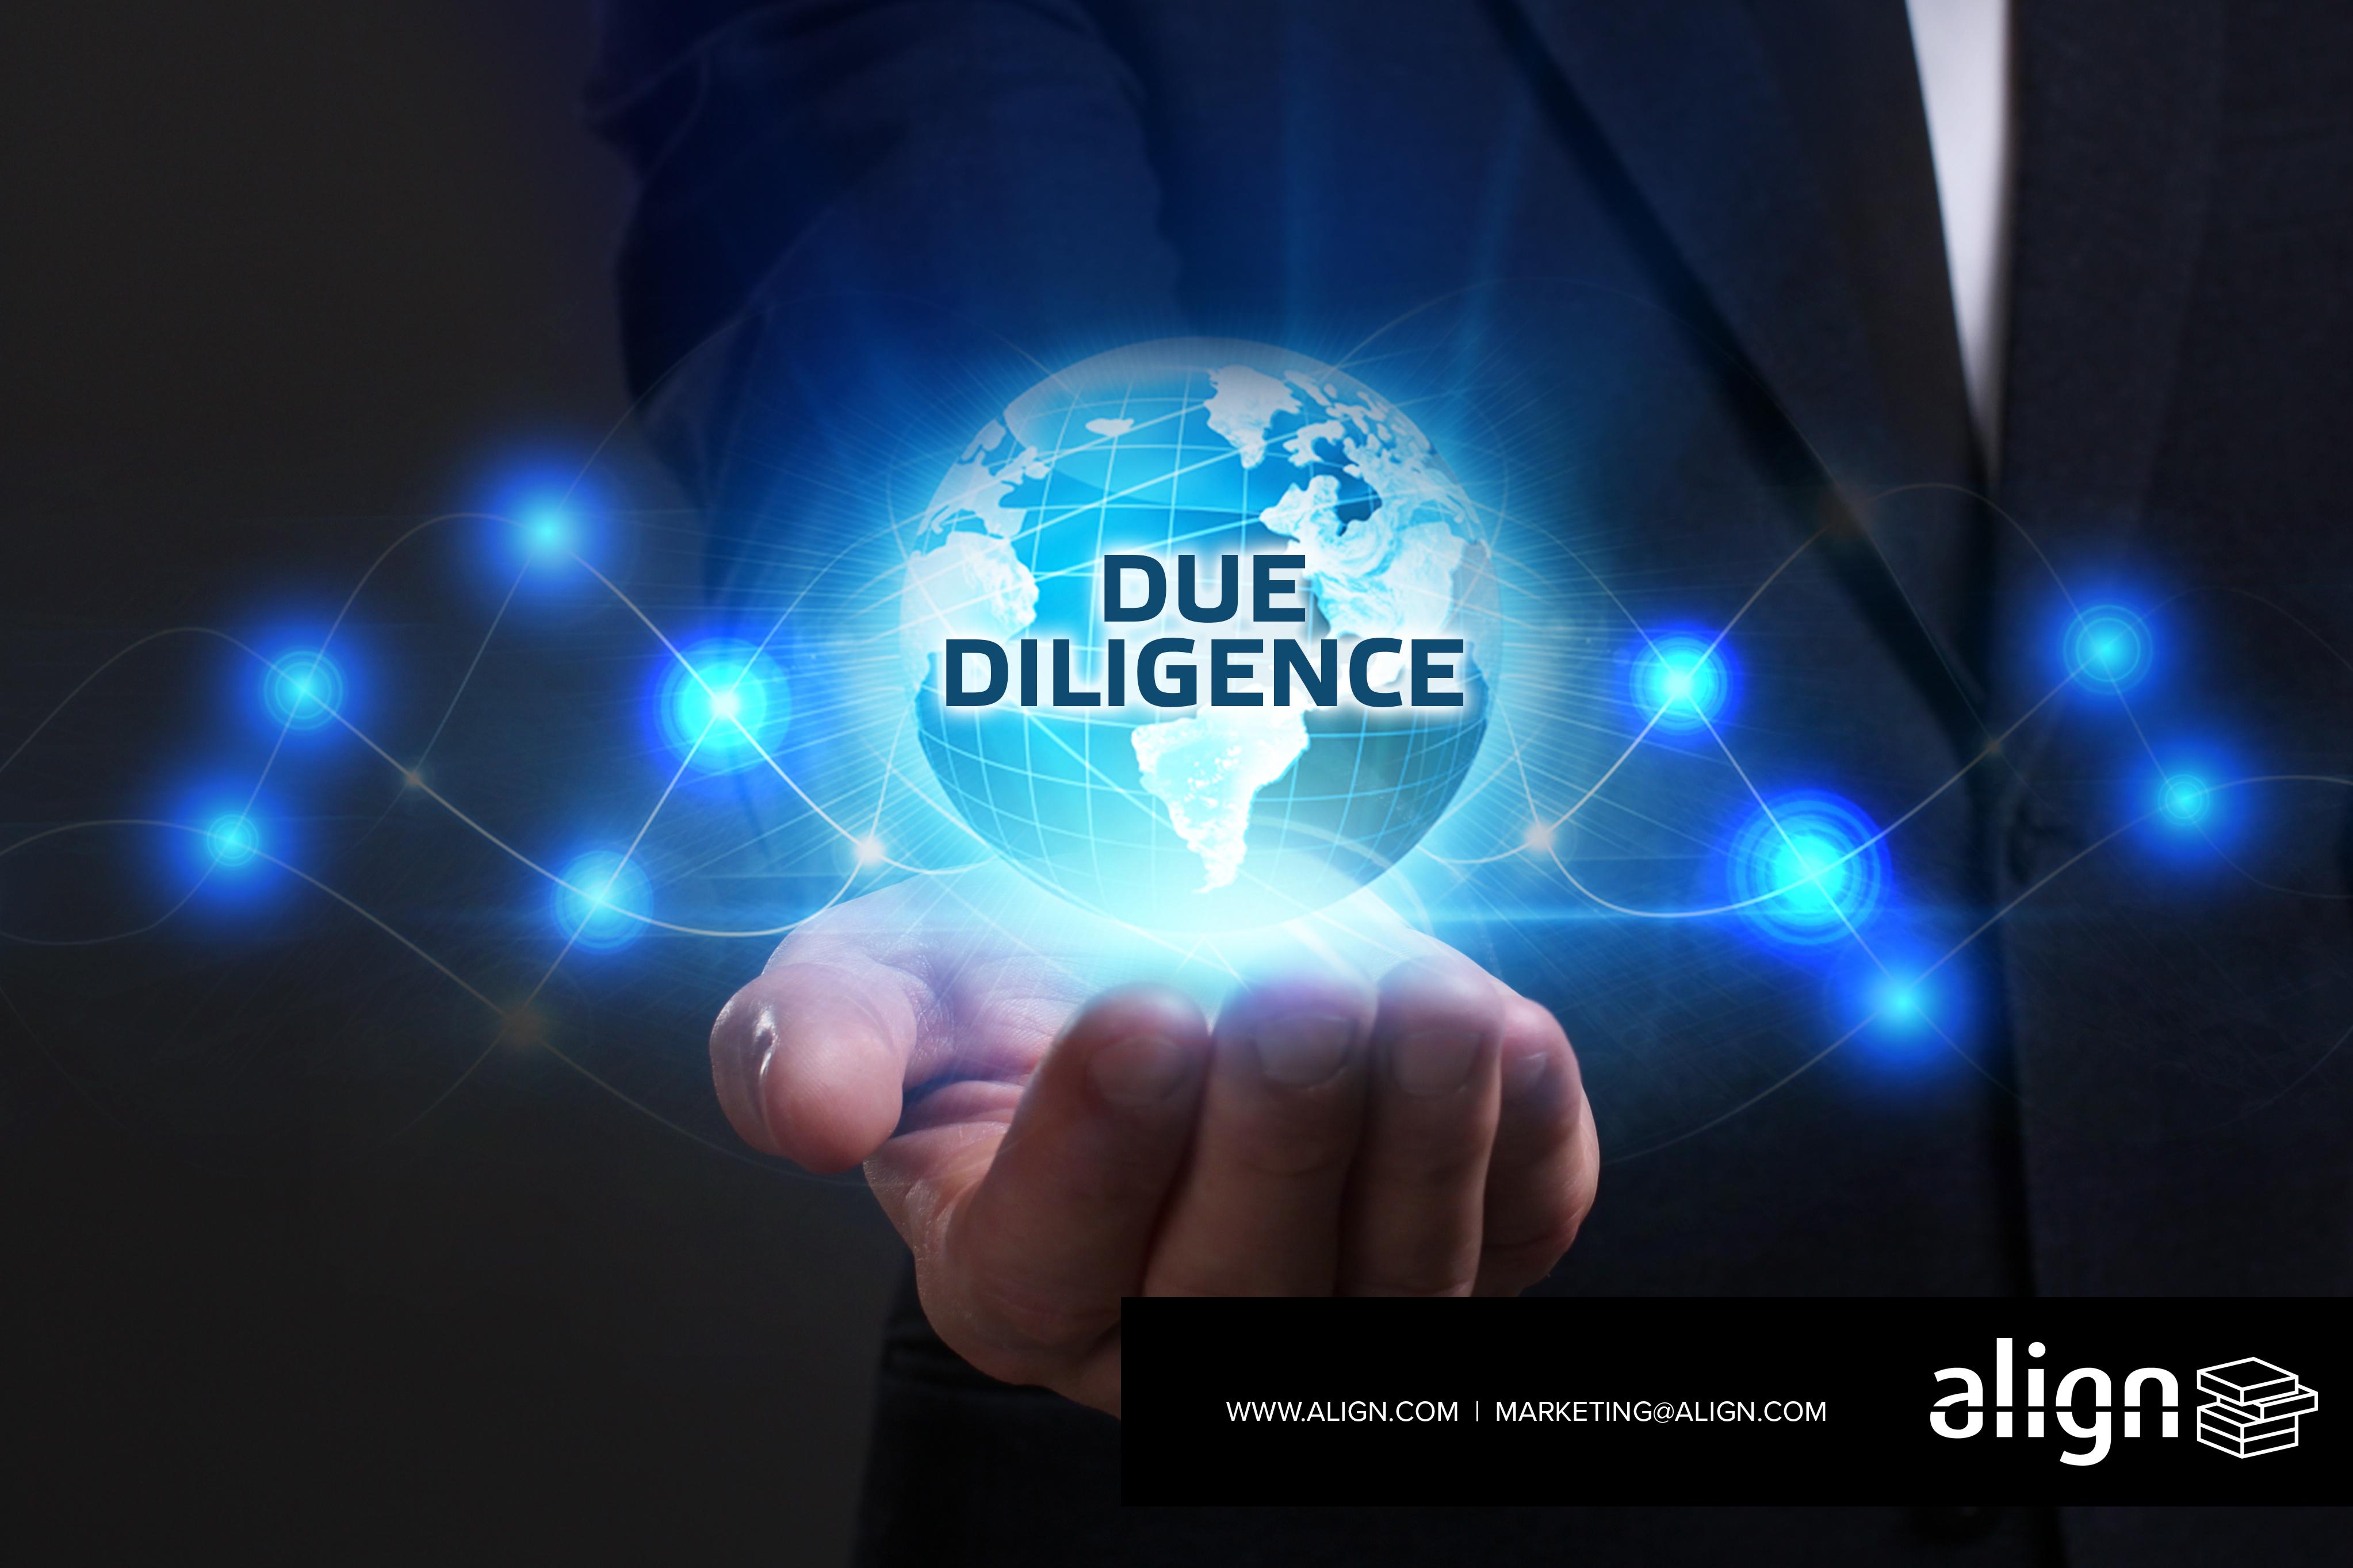 Align_Due-Diligence